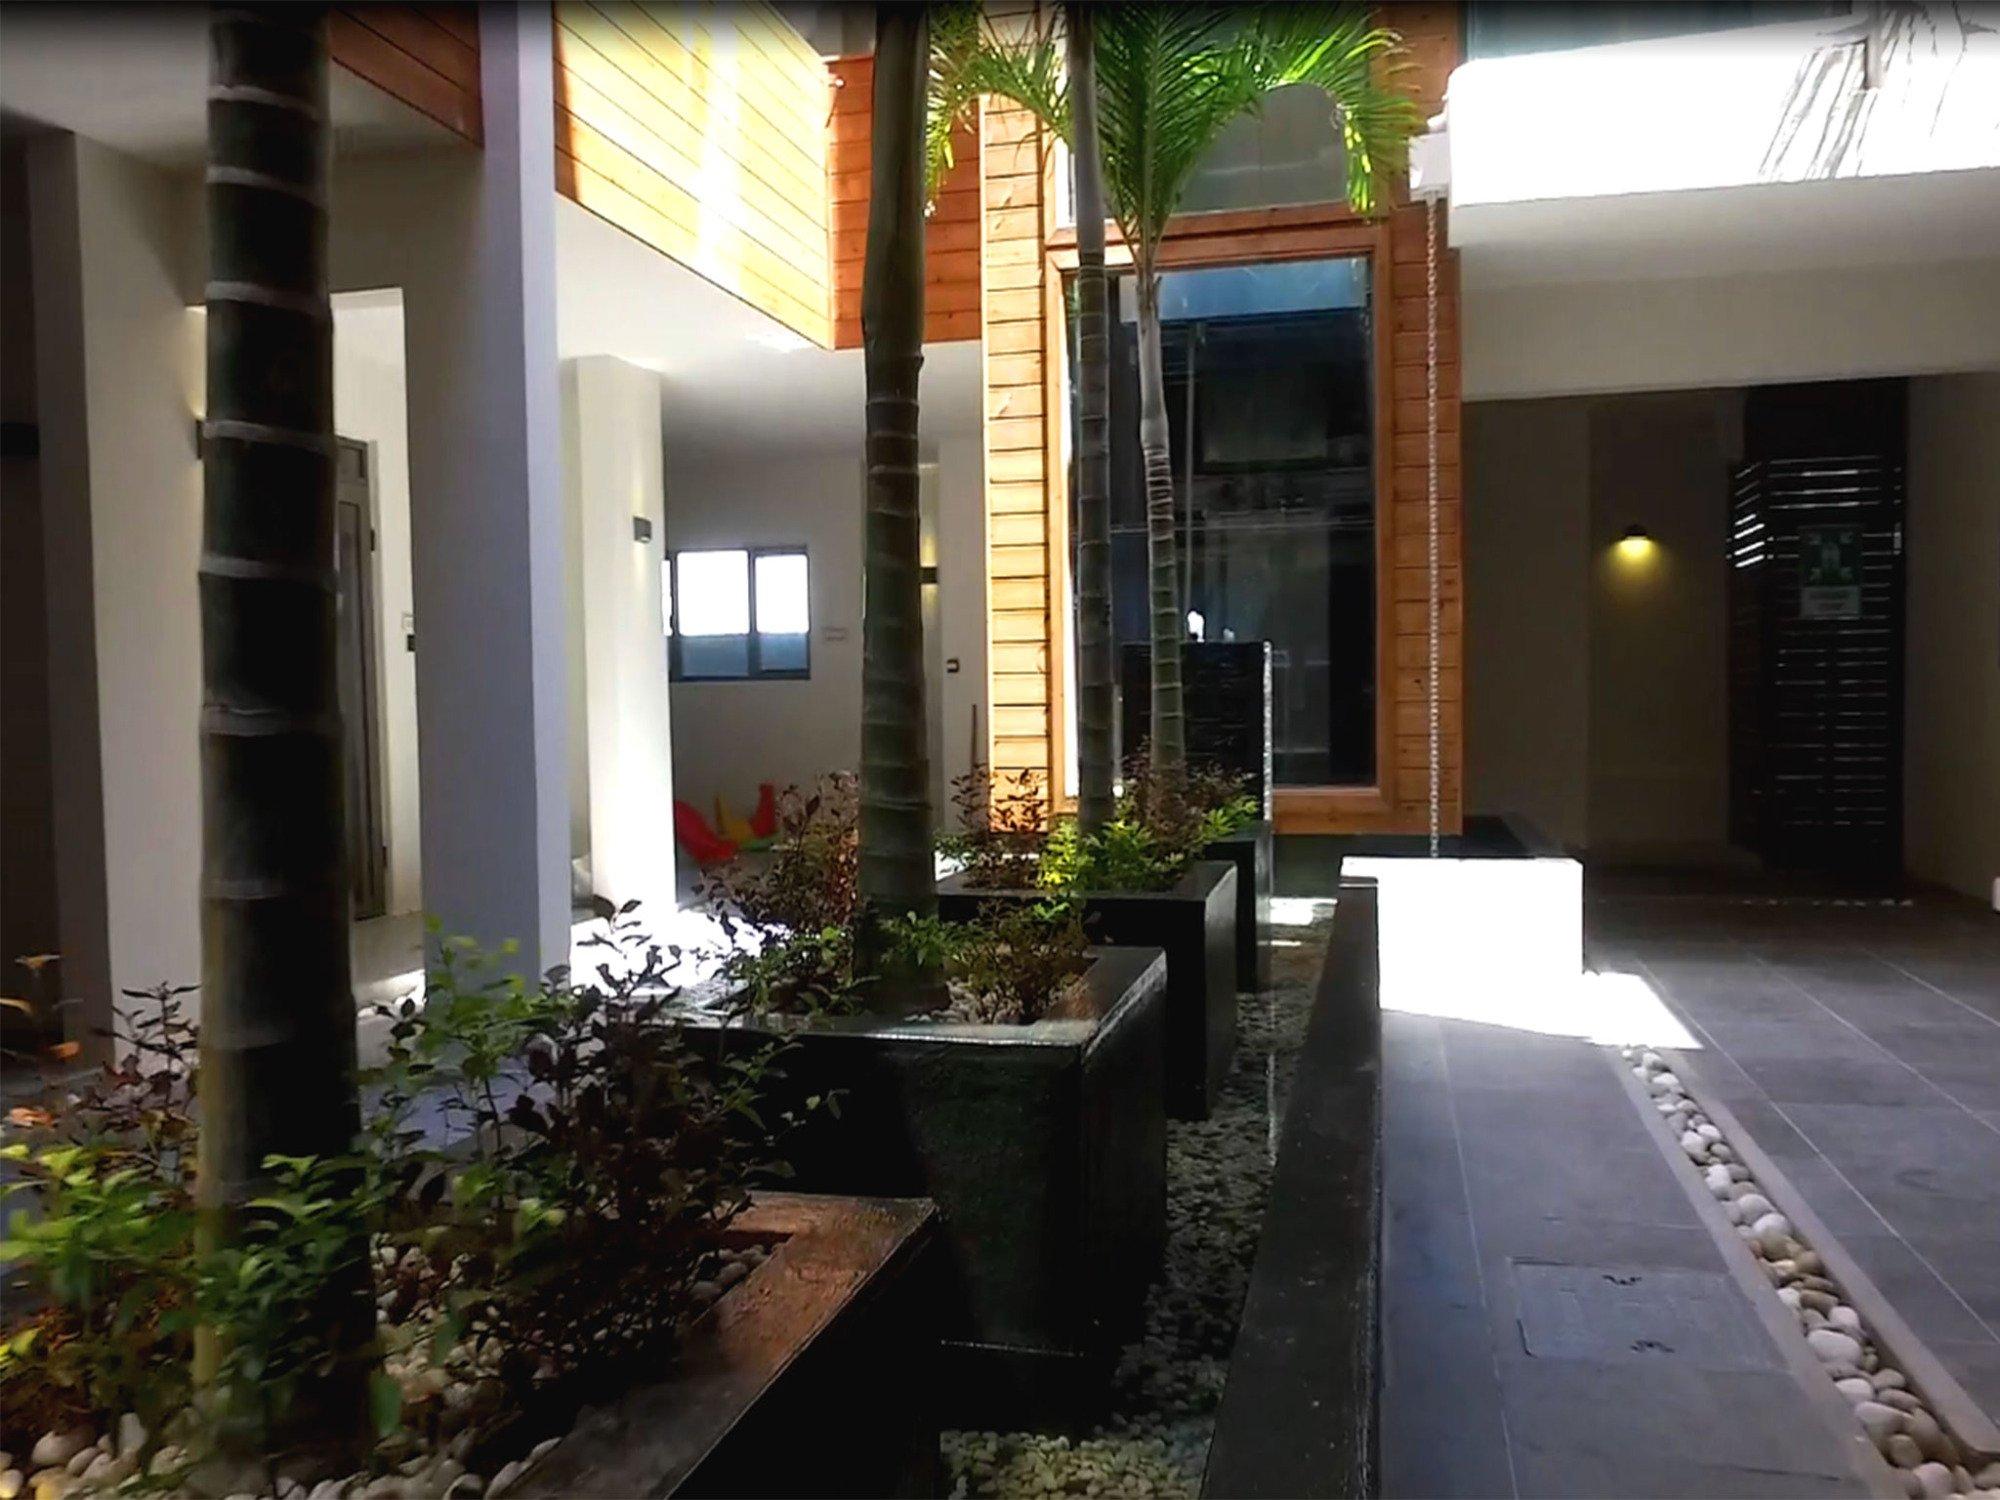 Pereybere Hotel & Spa